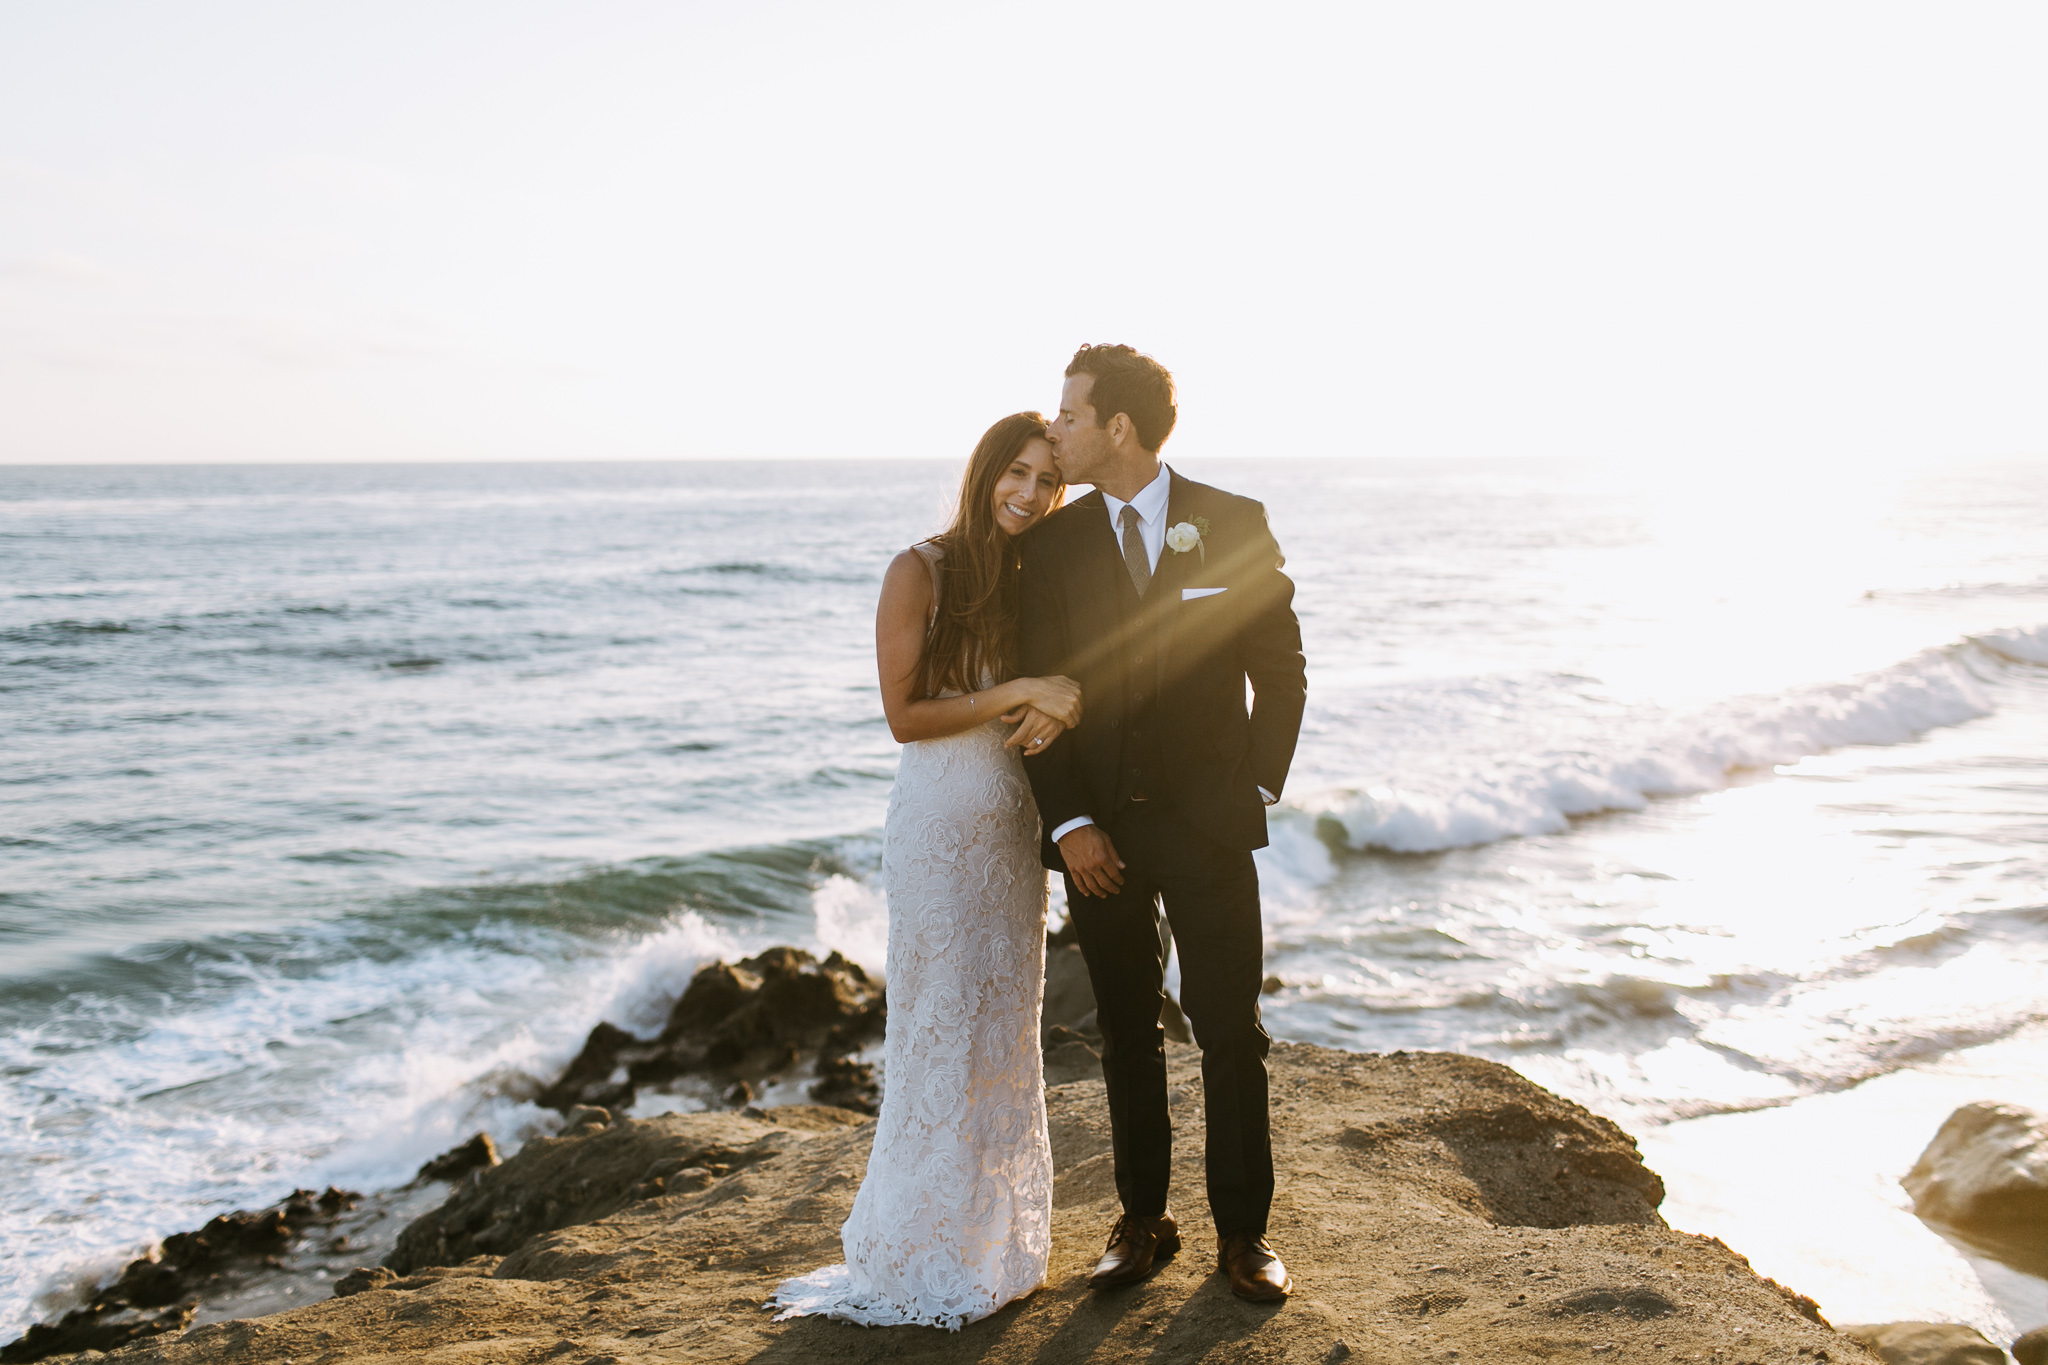 LagunaBeach-WeddingPhotographer-53.jpg